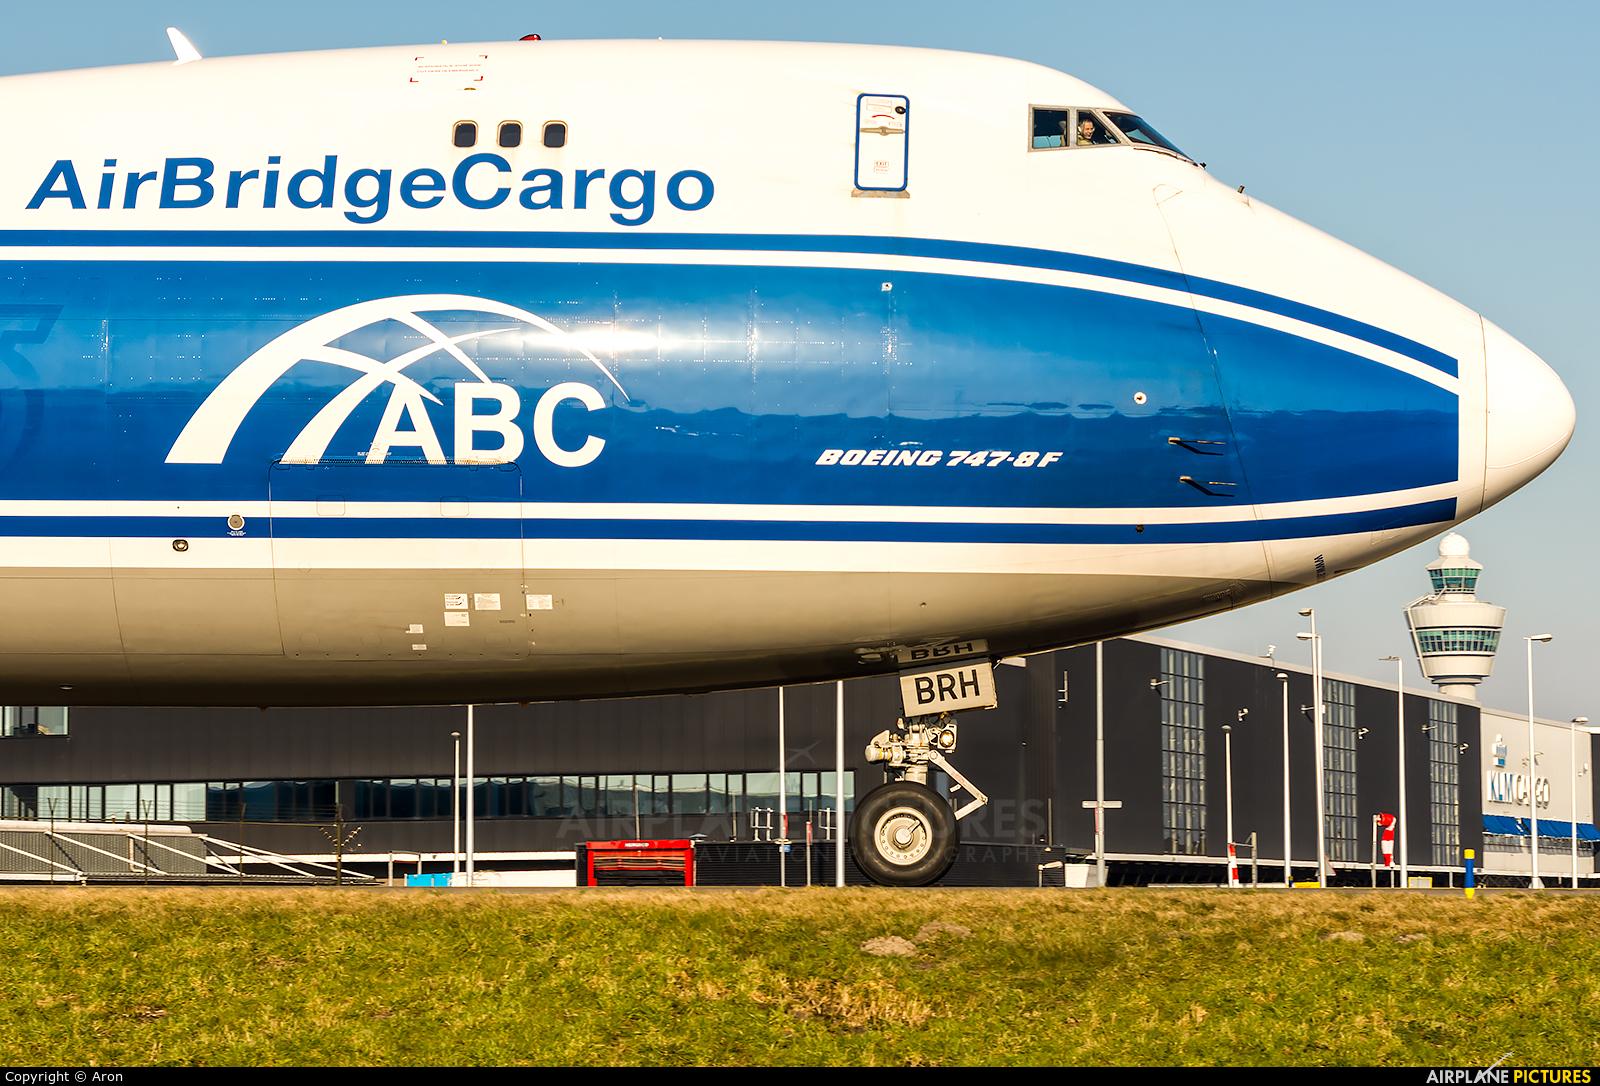 Air Bridge Cargo VQ-BRH aircraft at Amsterdam - Schiphol